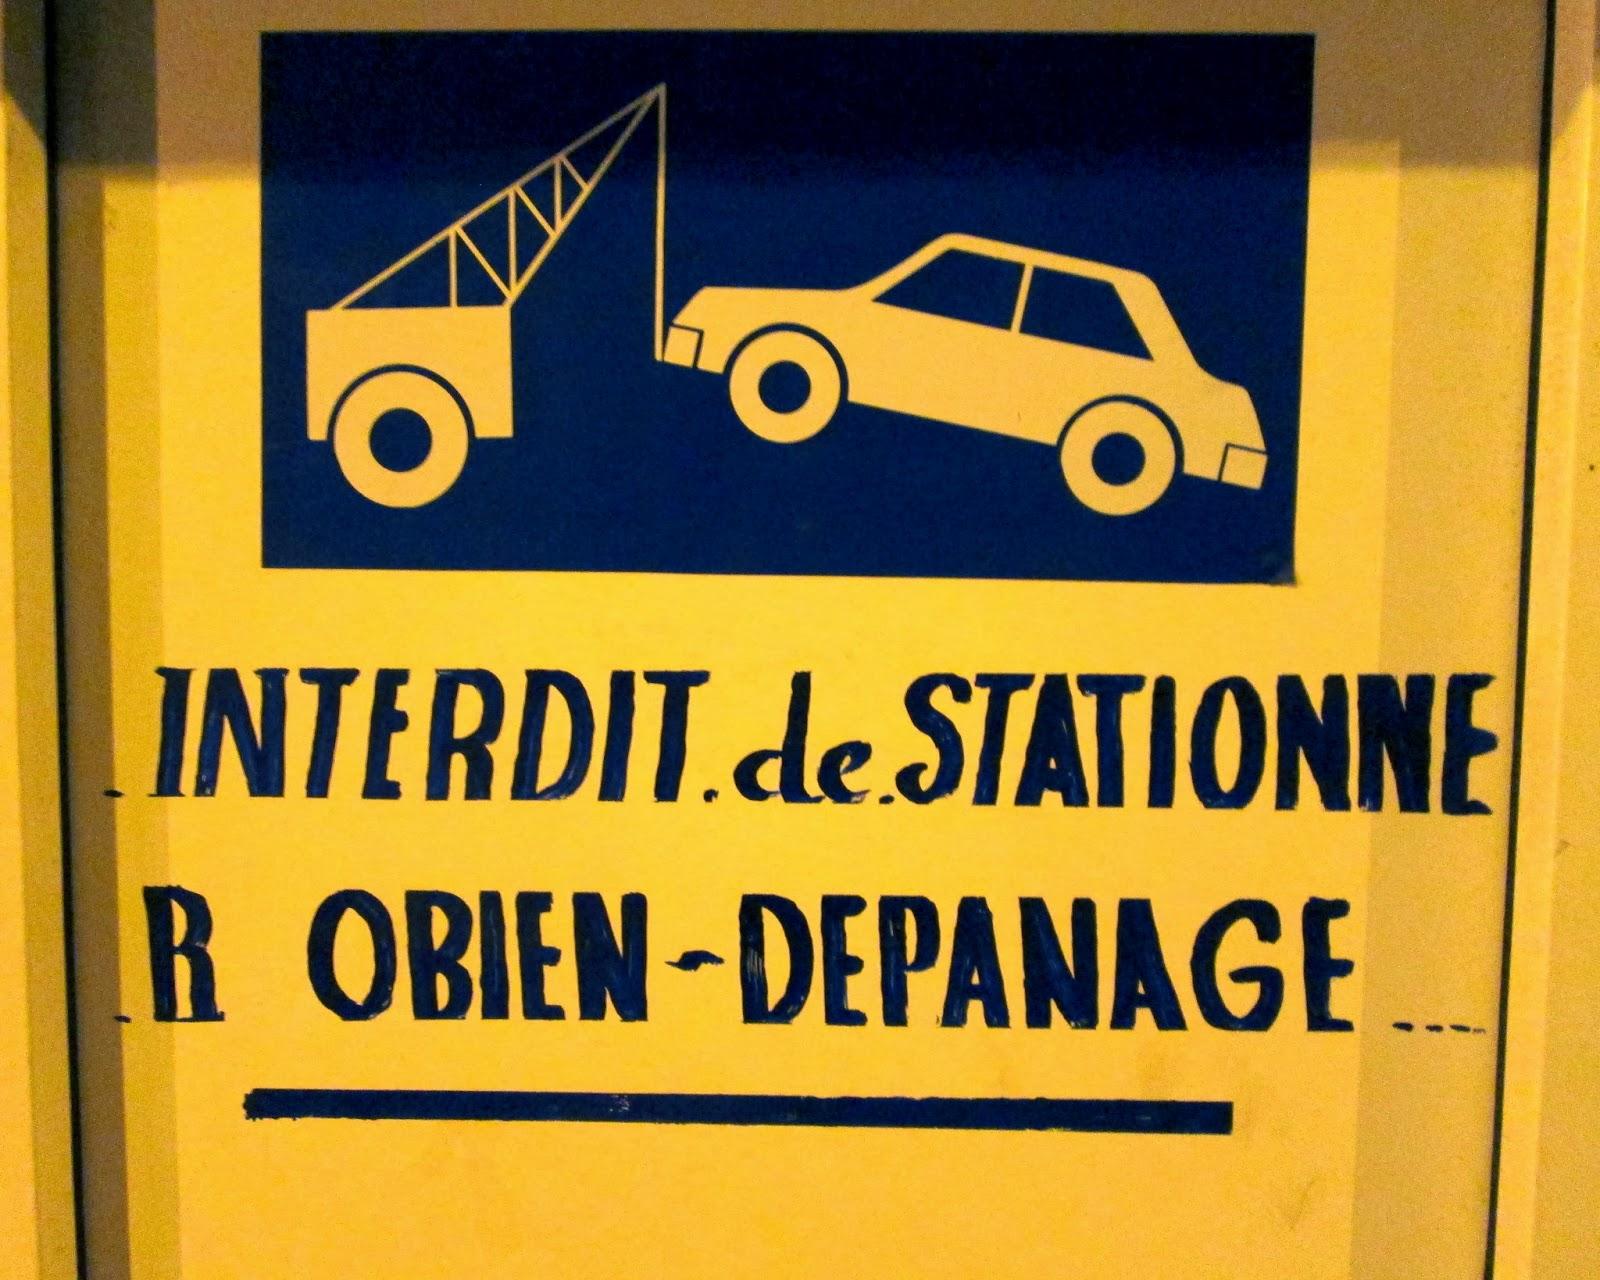 Brussels plan b traduction interdiction de stationner - Interdiction de stationner ...